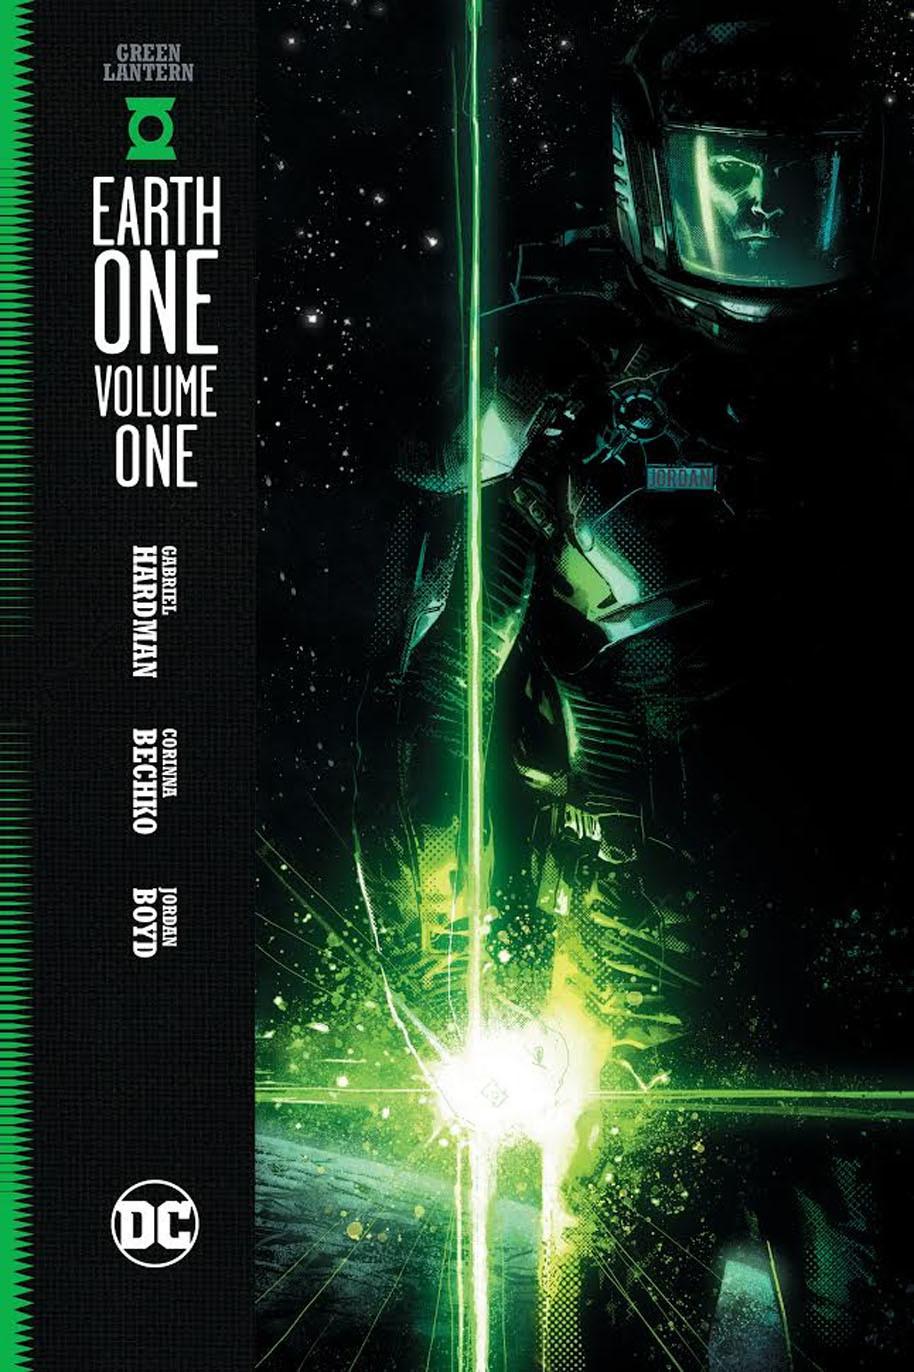 Green-Lantern-Earth-One-cover.jpg